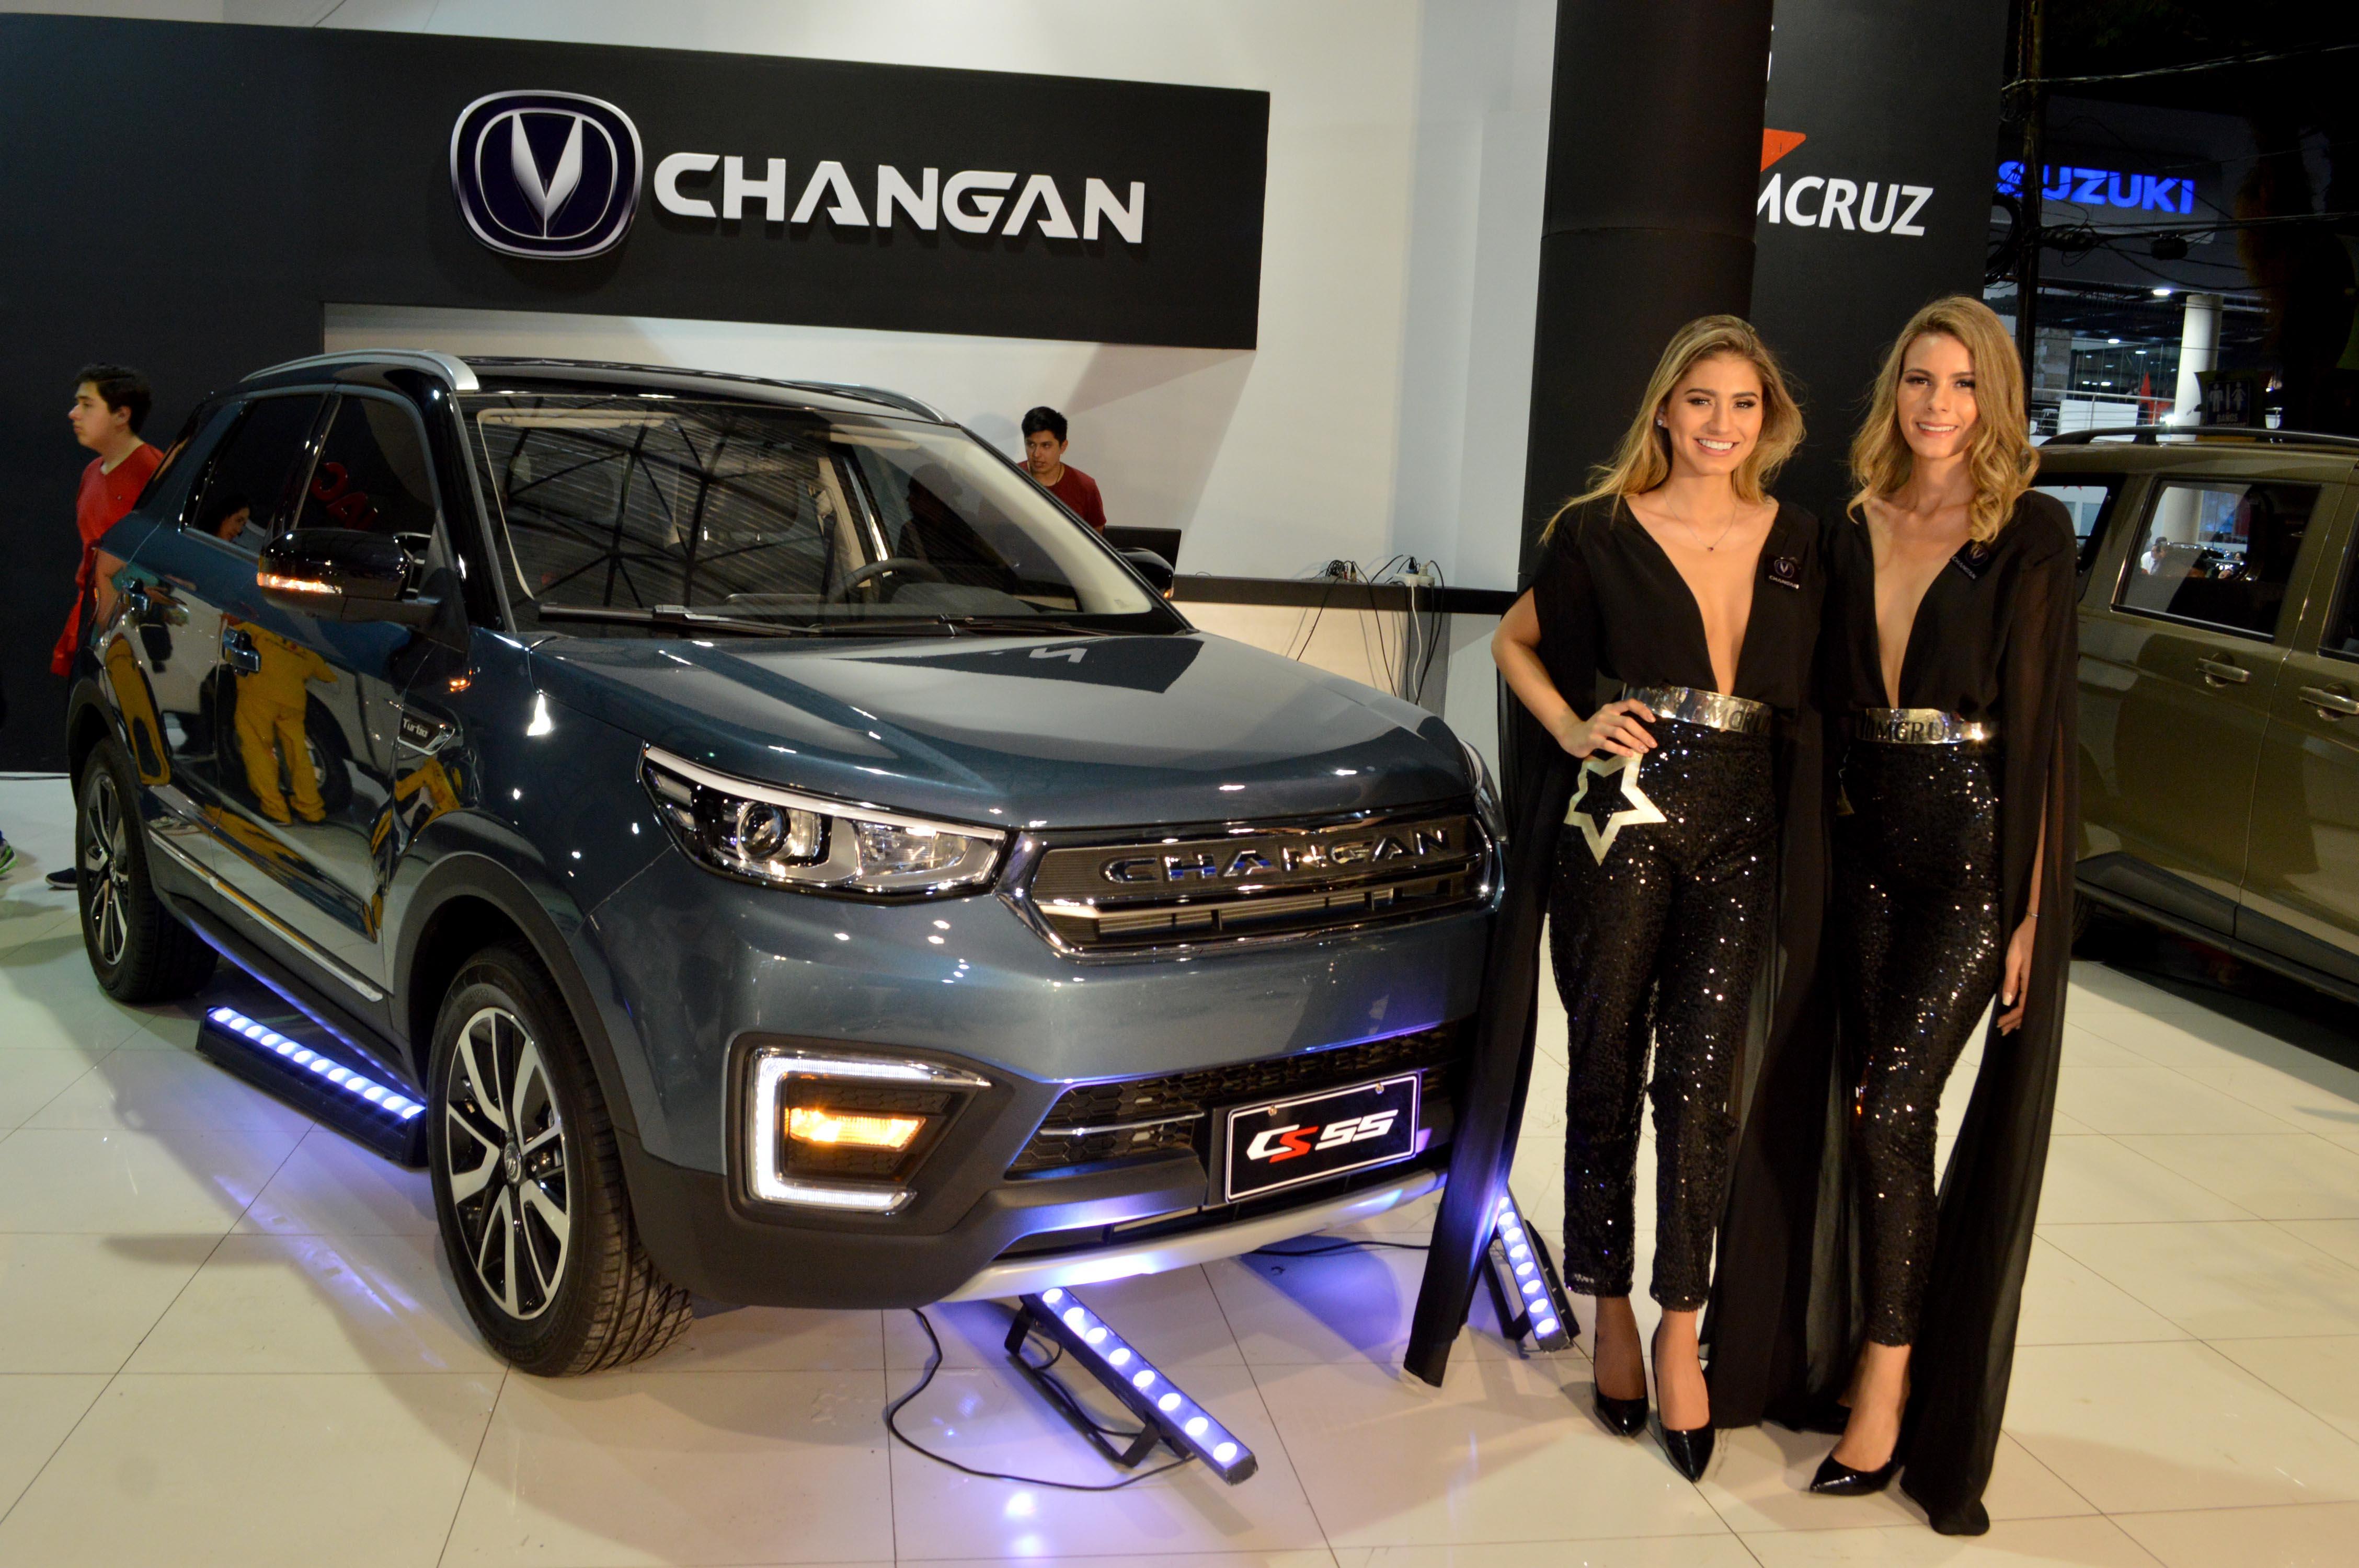 Cs55, la nueva SUV de Changan impacta en la Expocruz